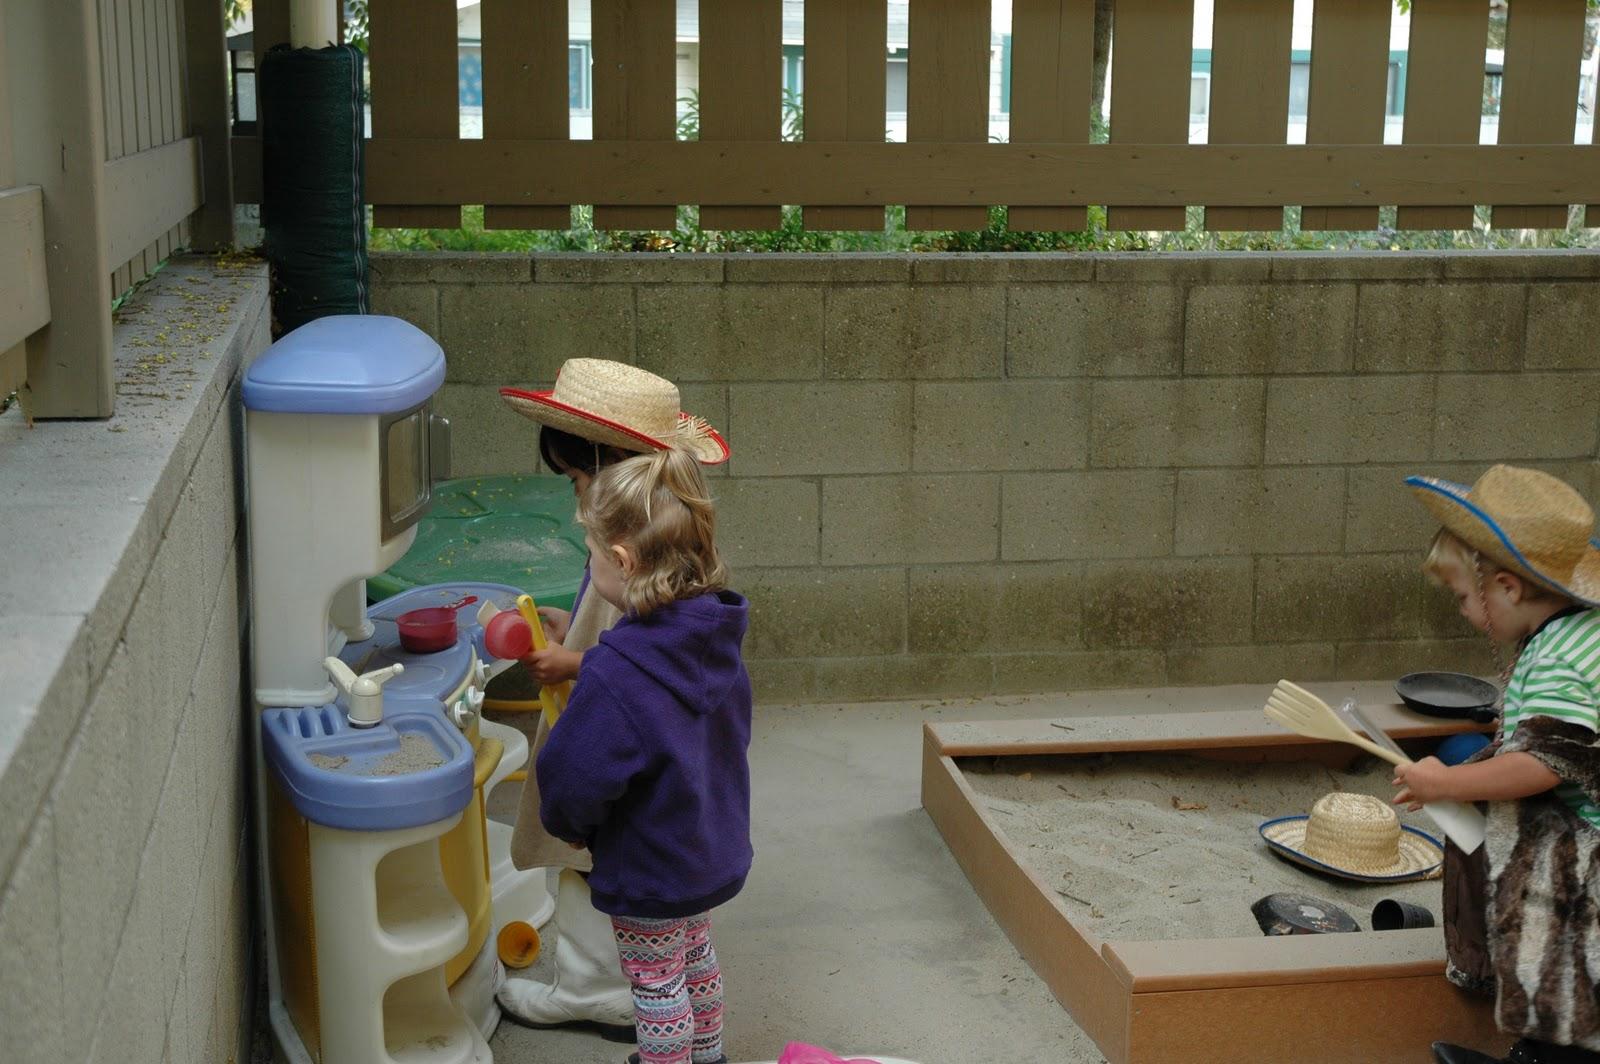 Outdoor Classroom Ideas Uk ~ Exploring the outdoor classroom dramatic play ideas